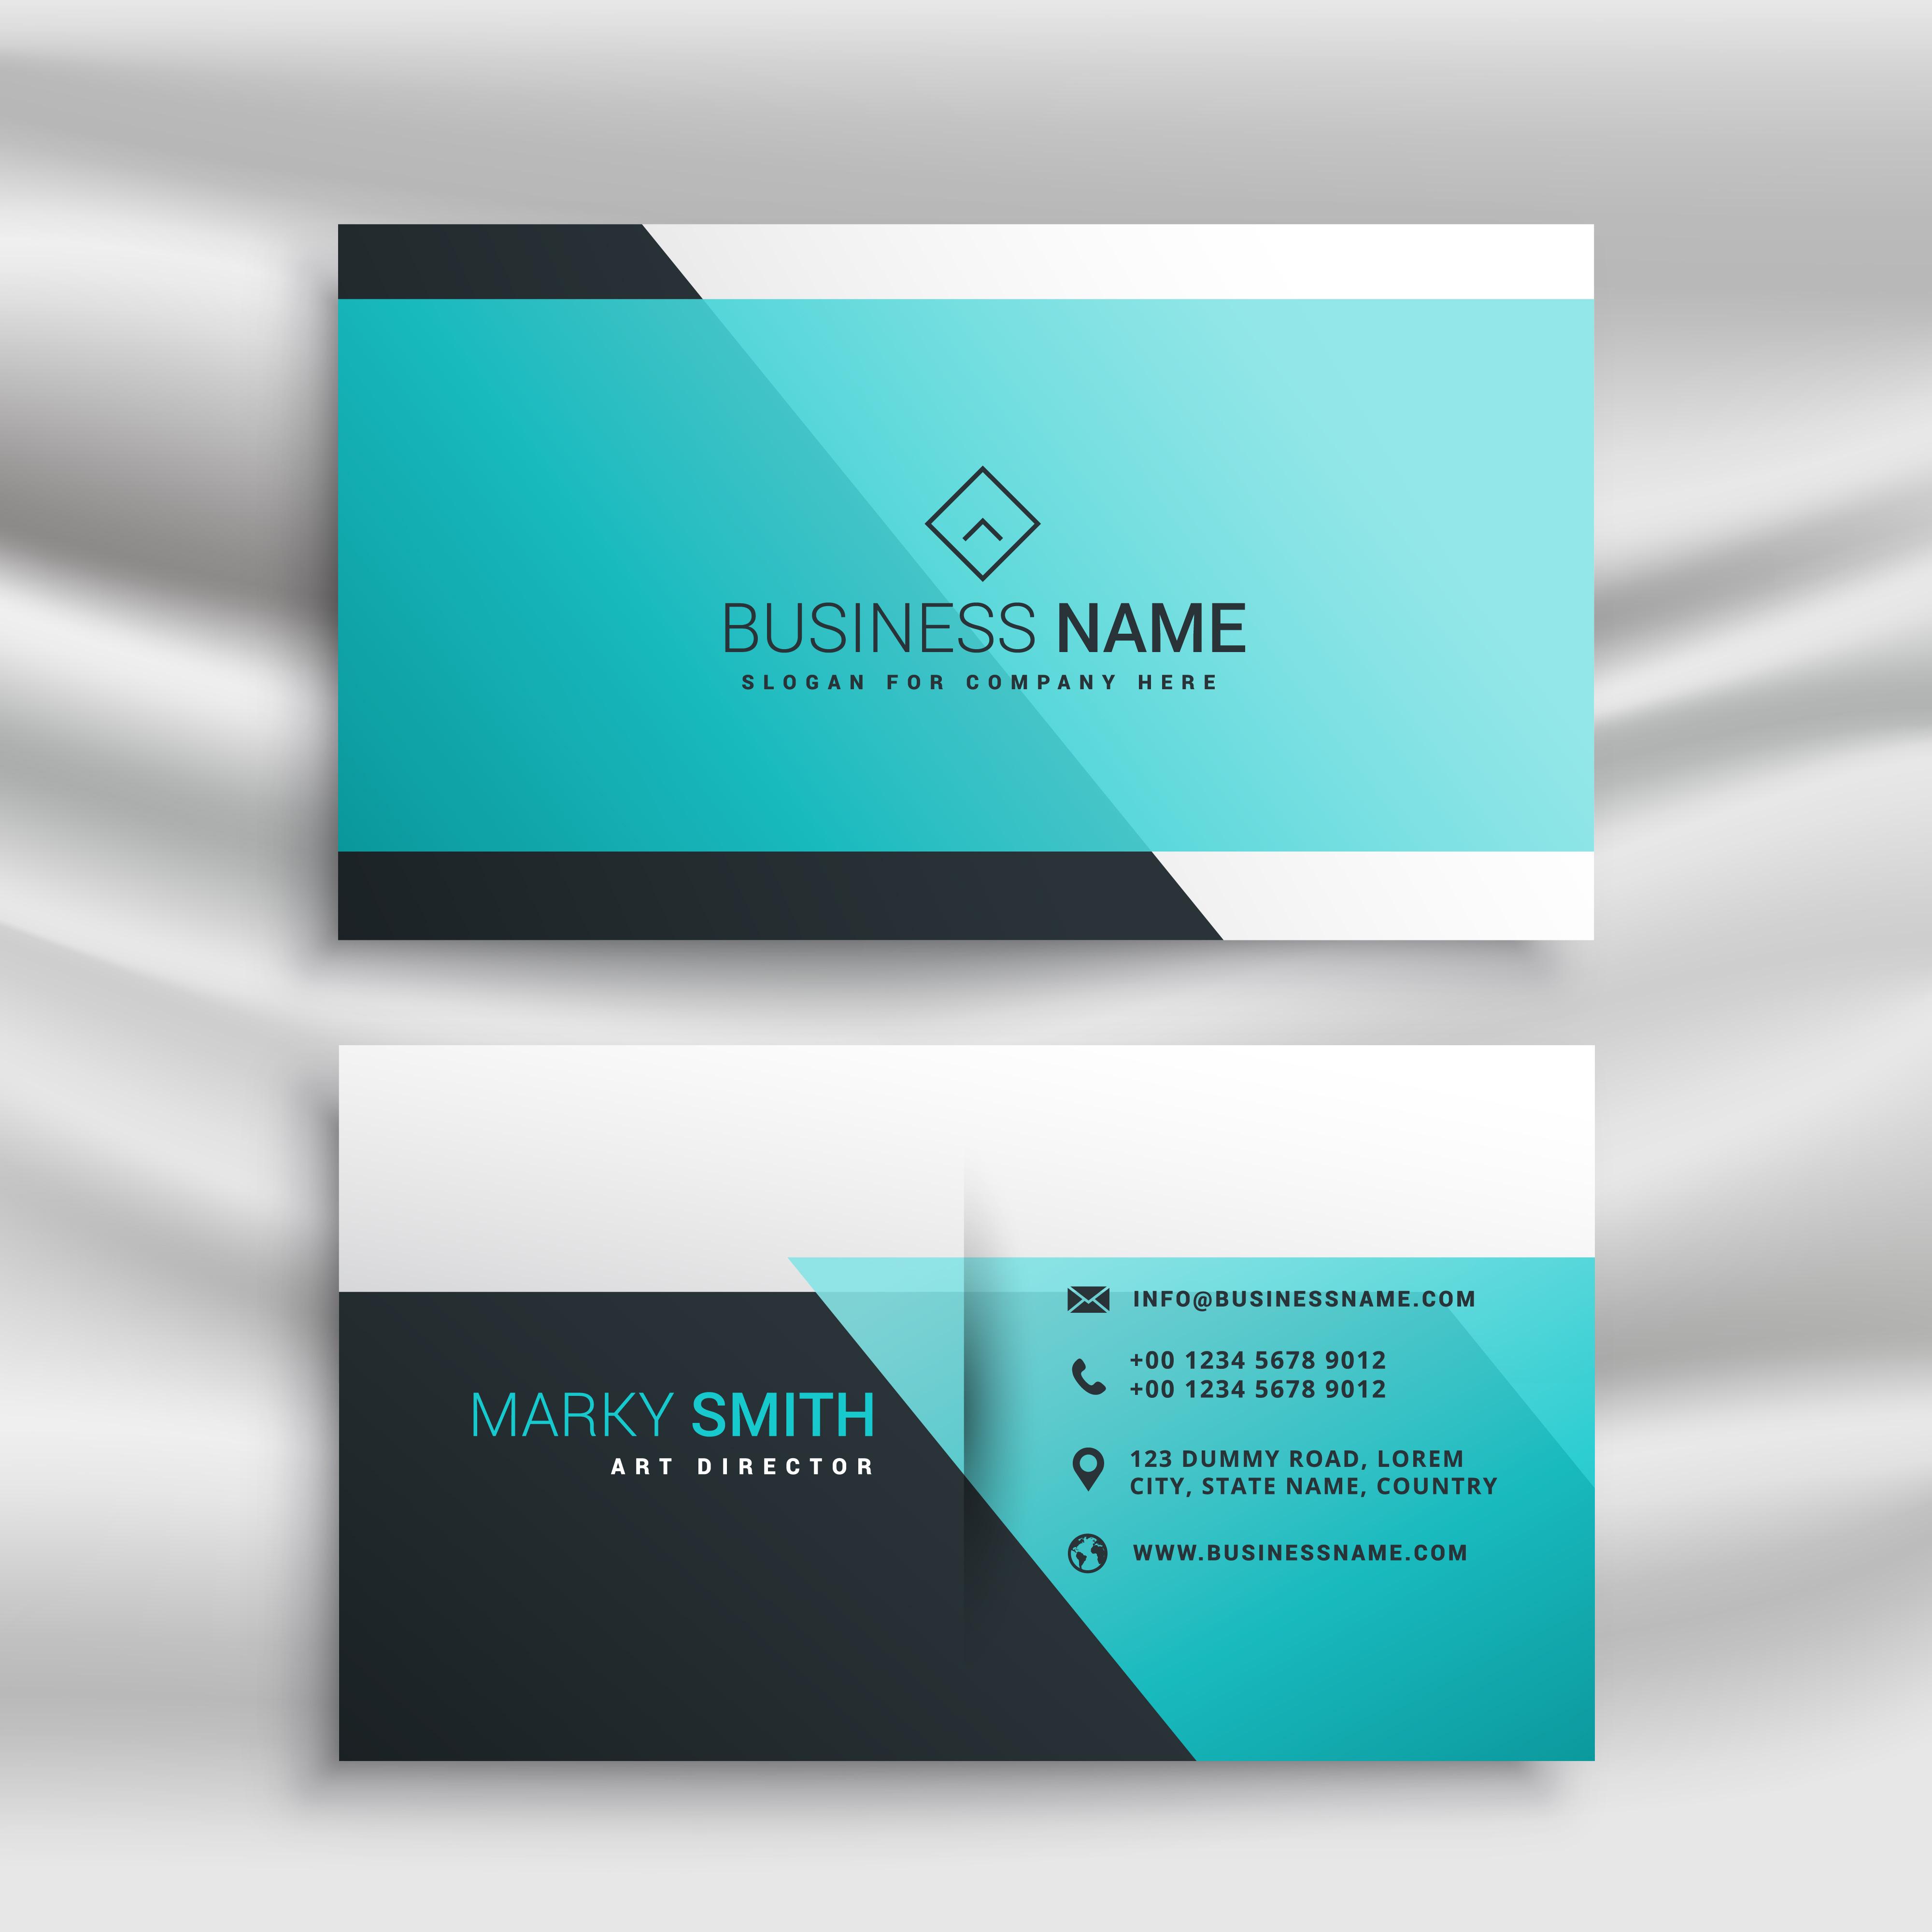 elegant business card design template with blue shapes - Download ...